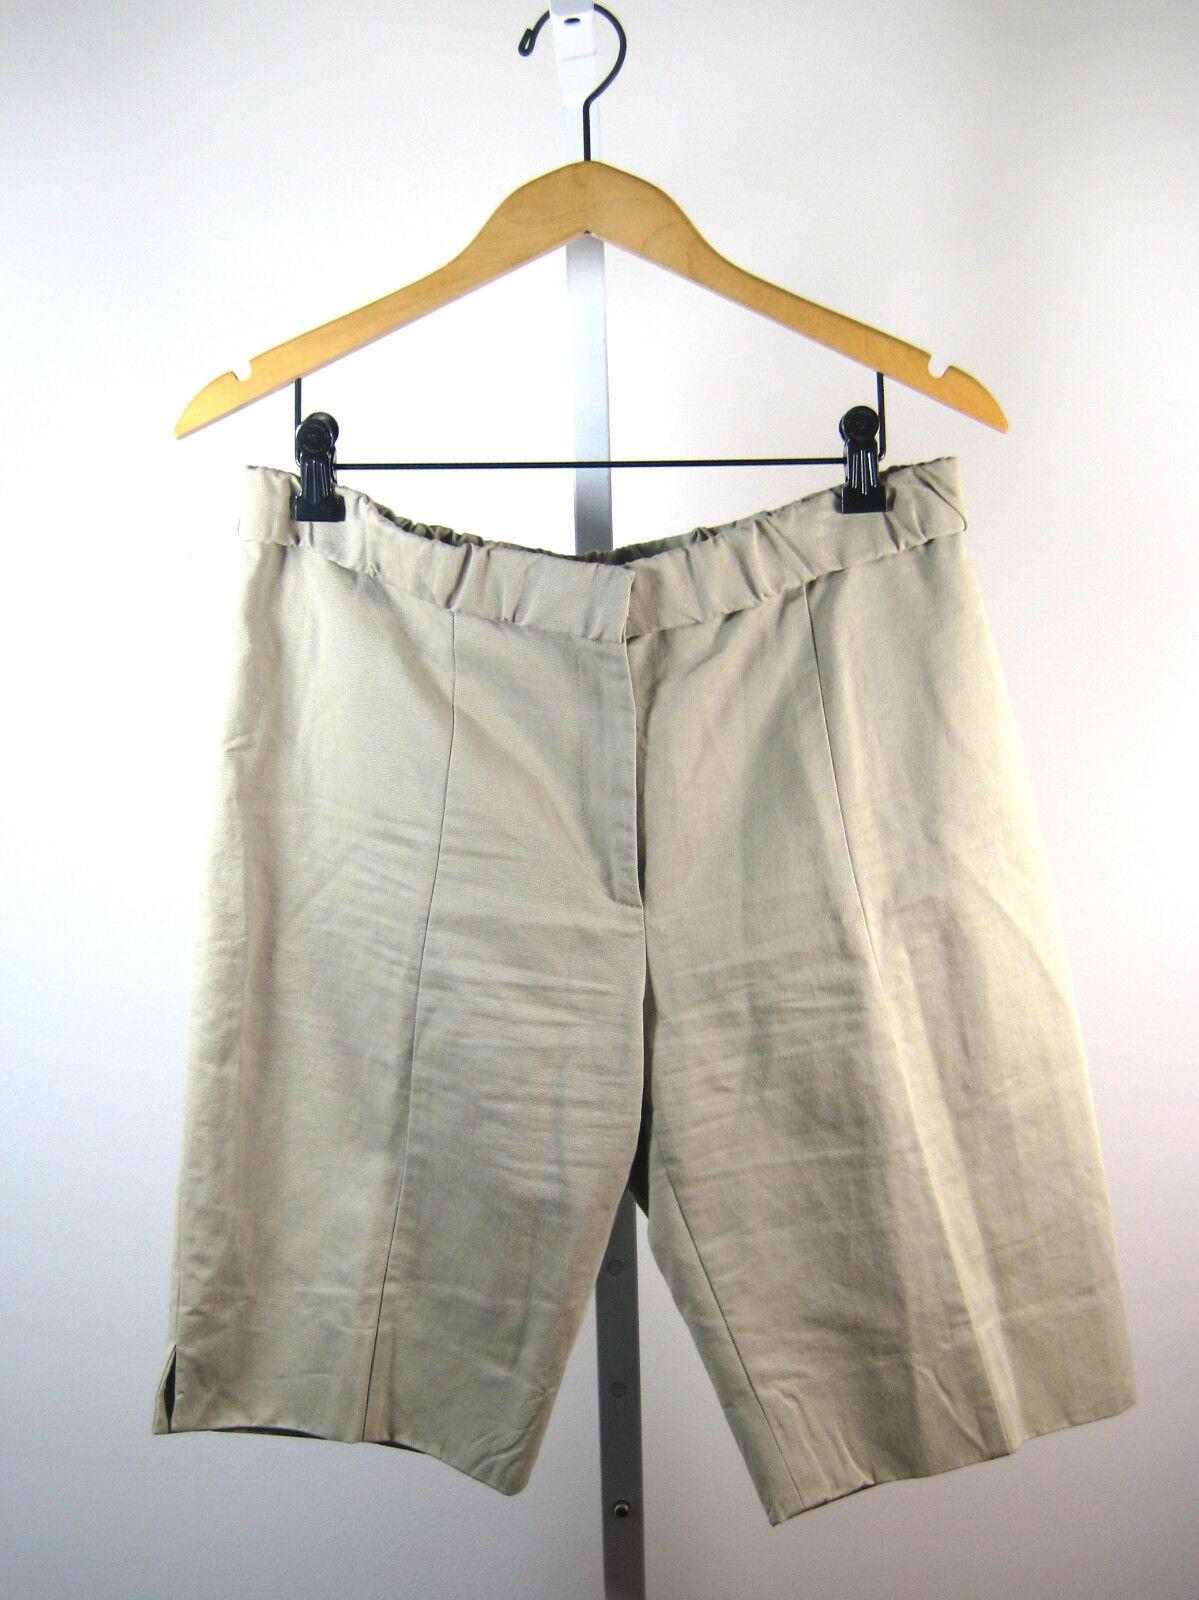 CACHAREL Tan Cotton Linen Knee Length Walking Short Size 10